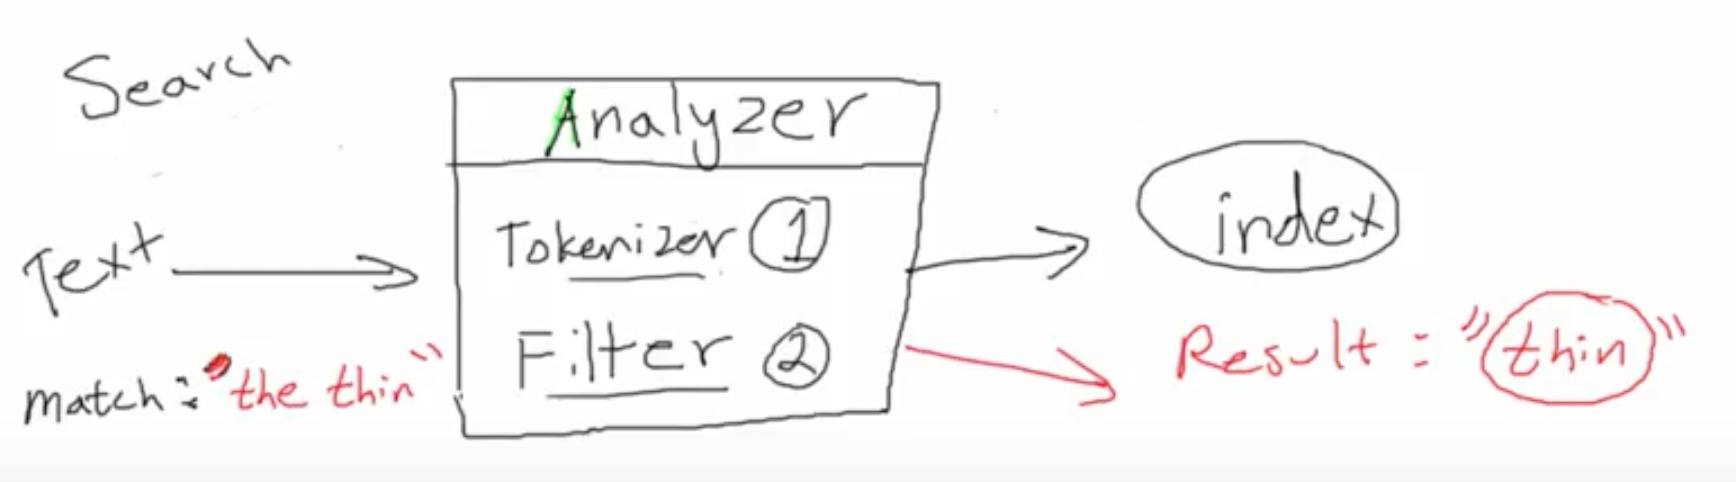 elasticsearch_analyzer